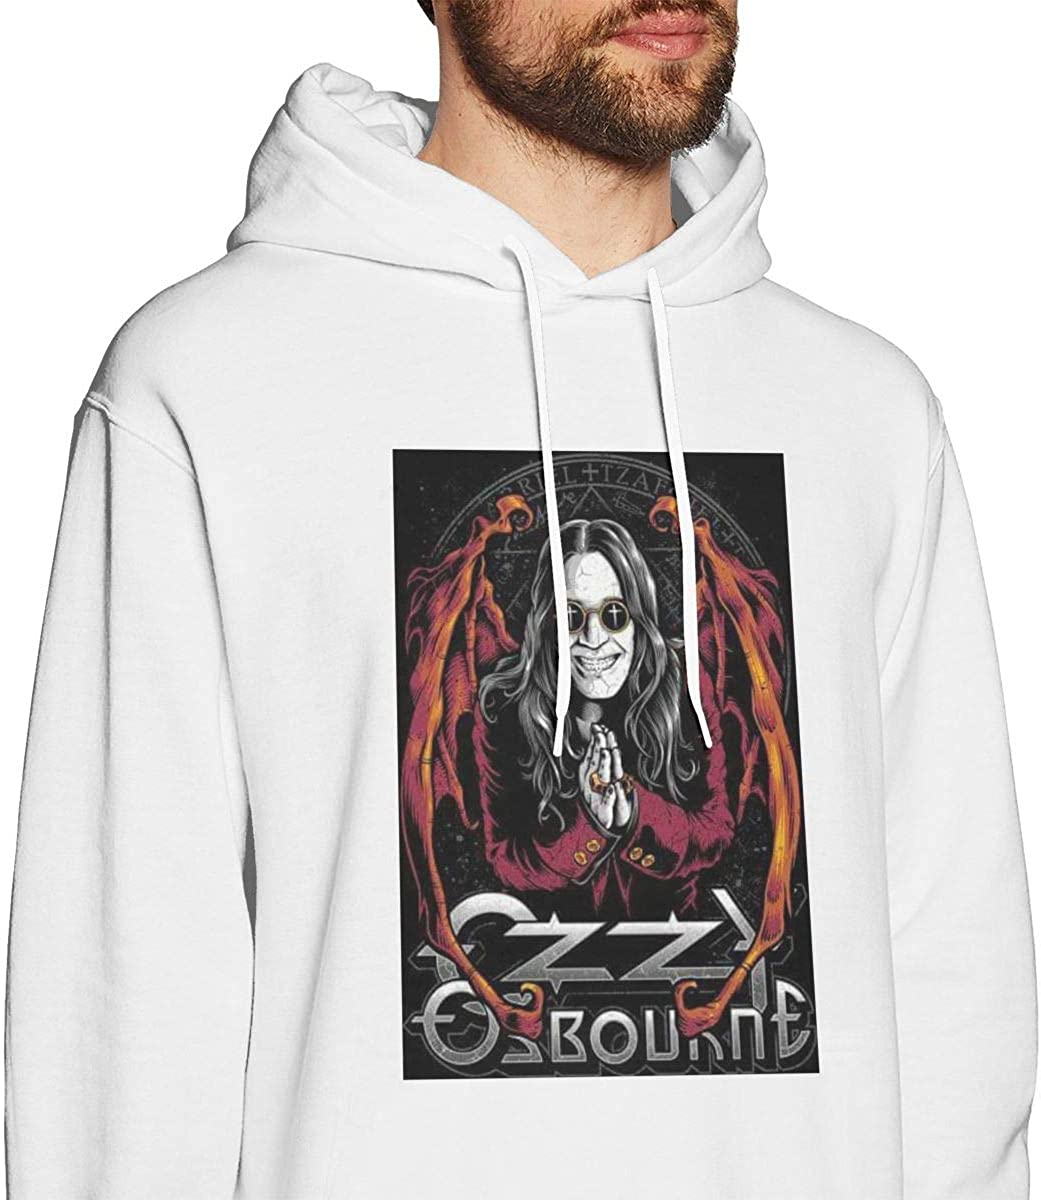 HelplesS Ozzy Osbourne Fashion Mens Hat and Pocketless Sweater White XL